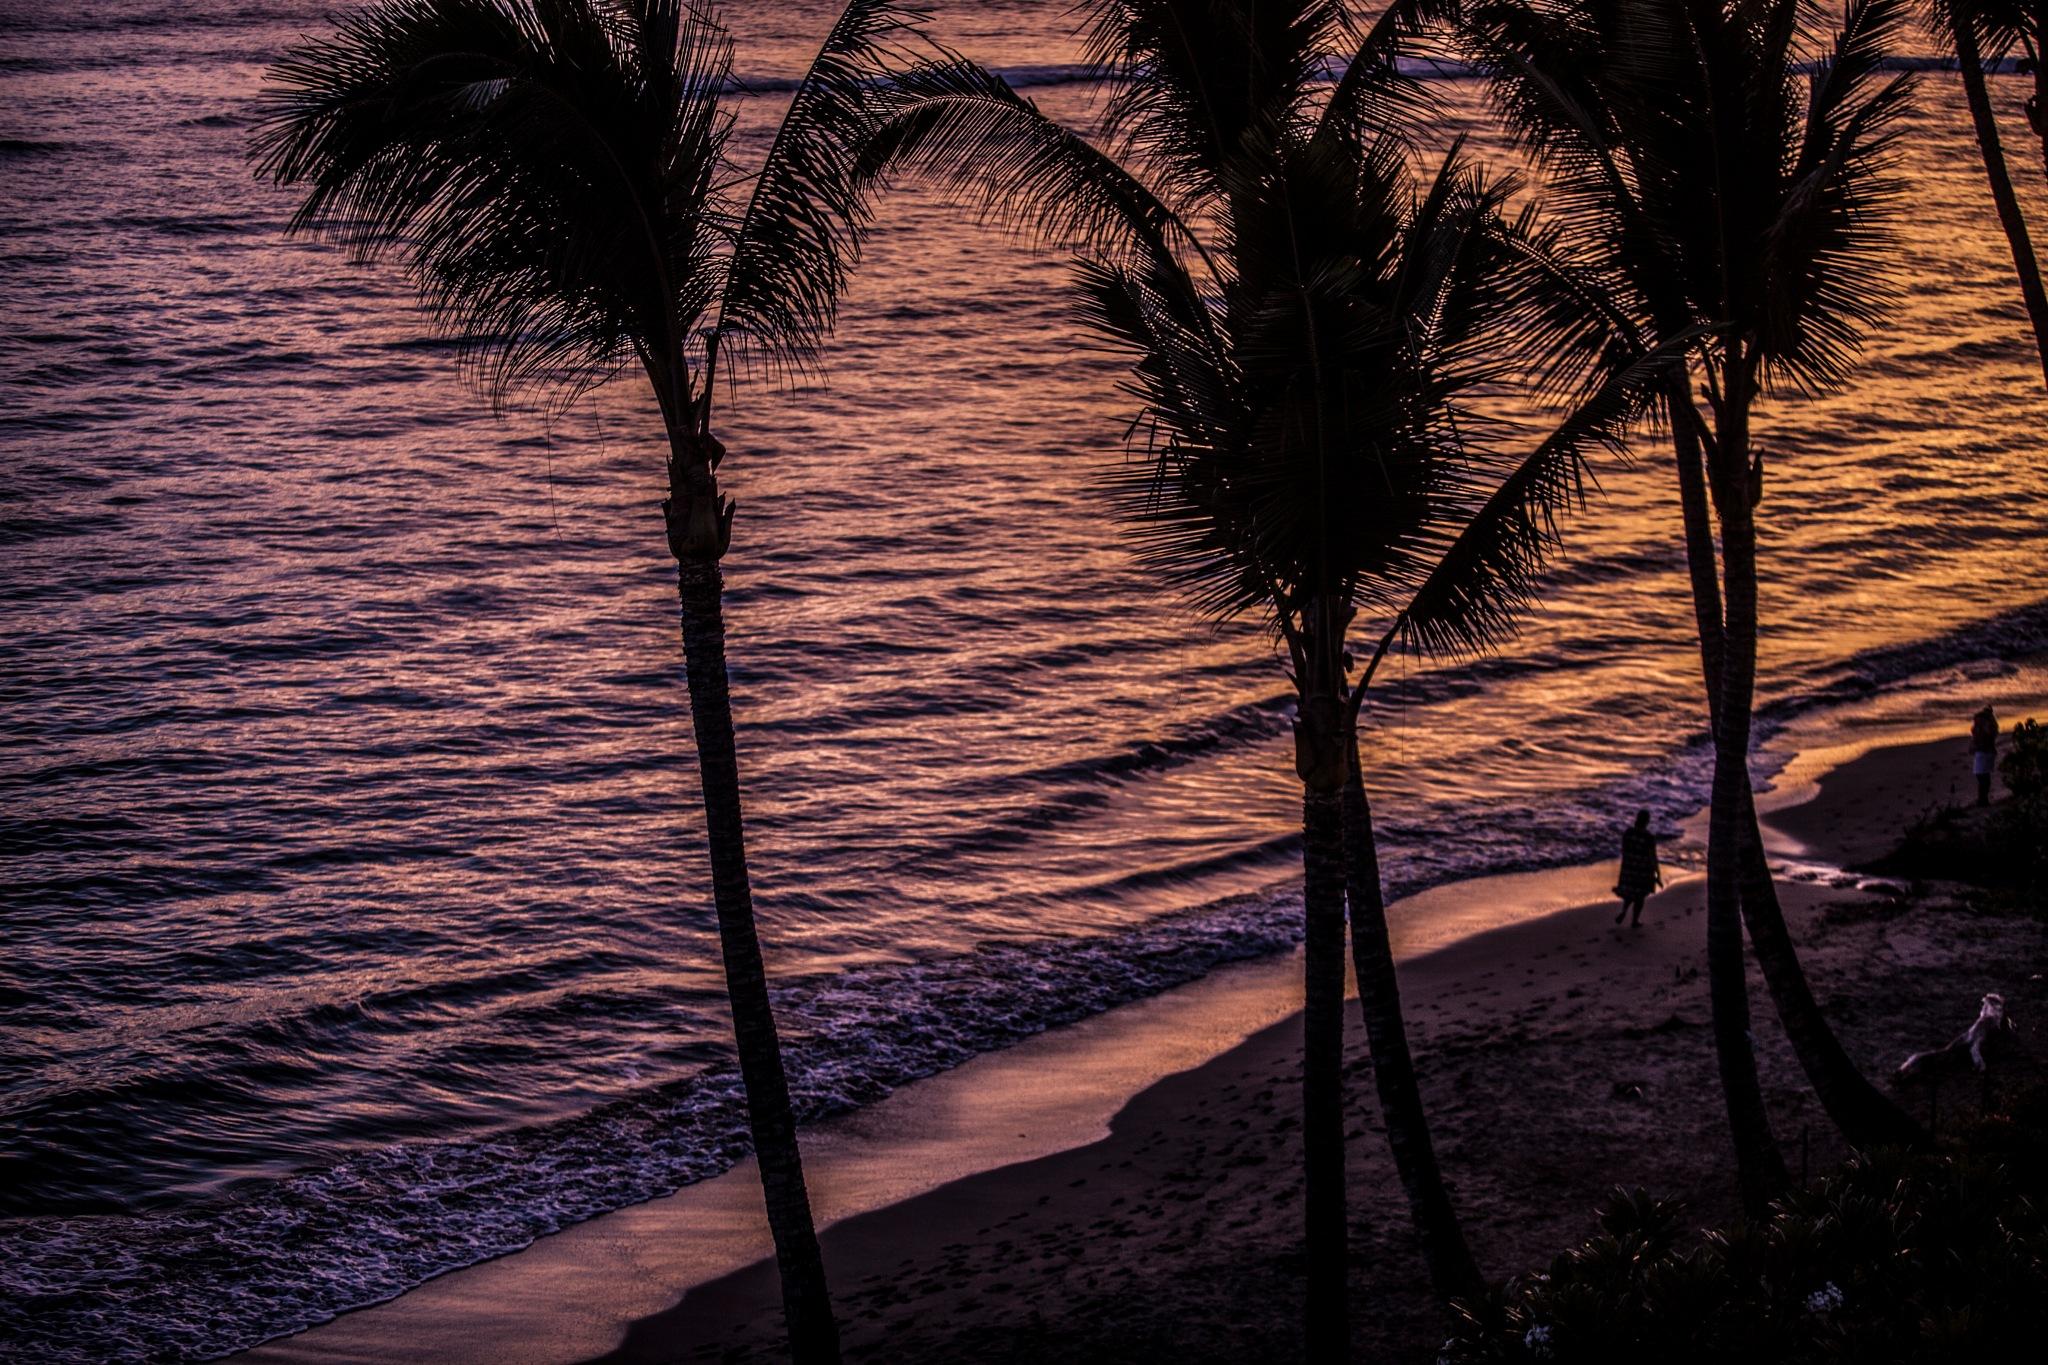 ON THE BEACH by Justine Cahn Fenu